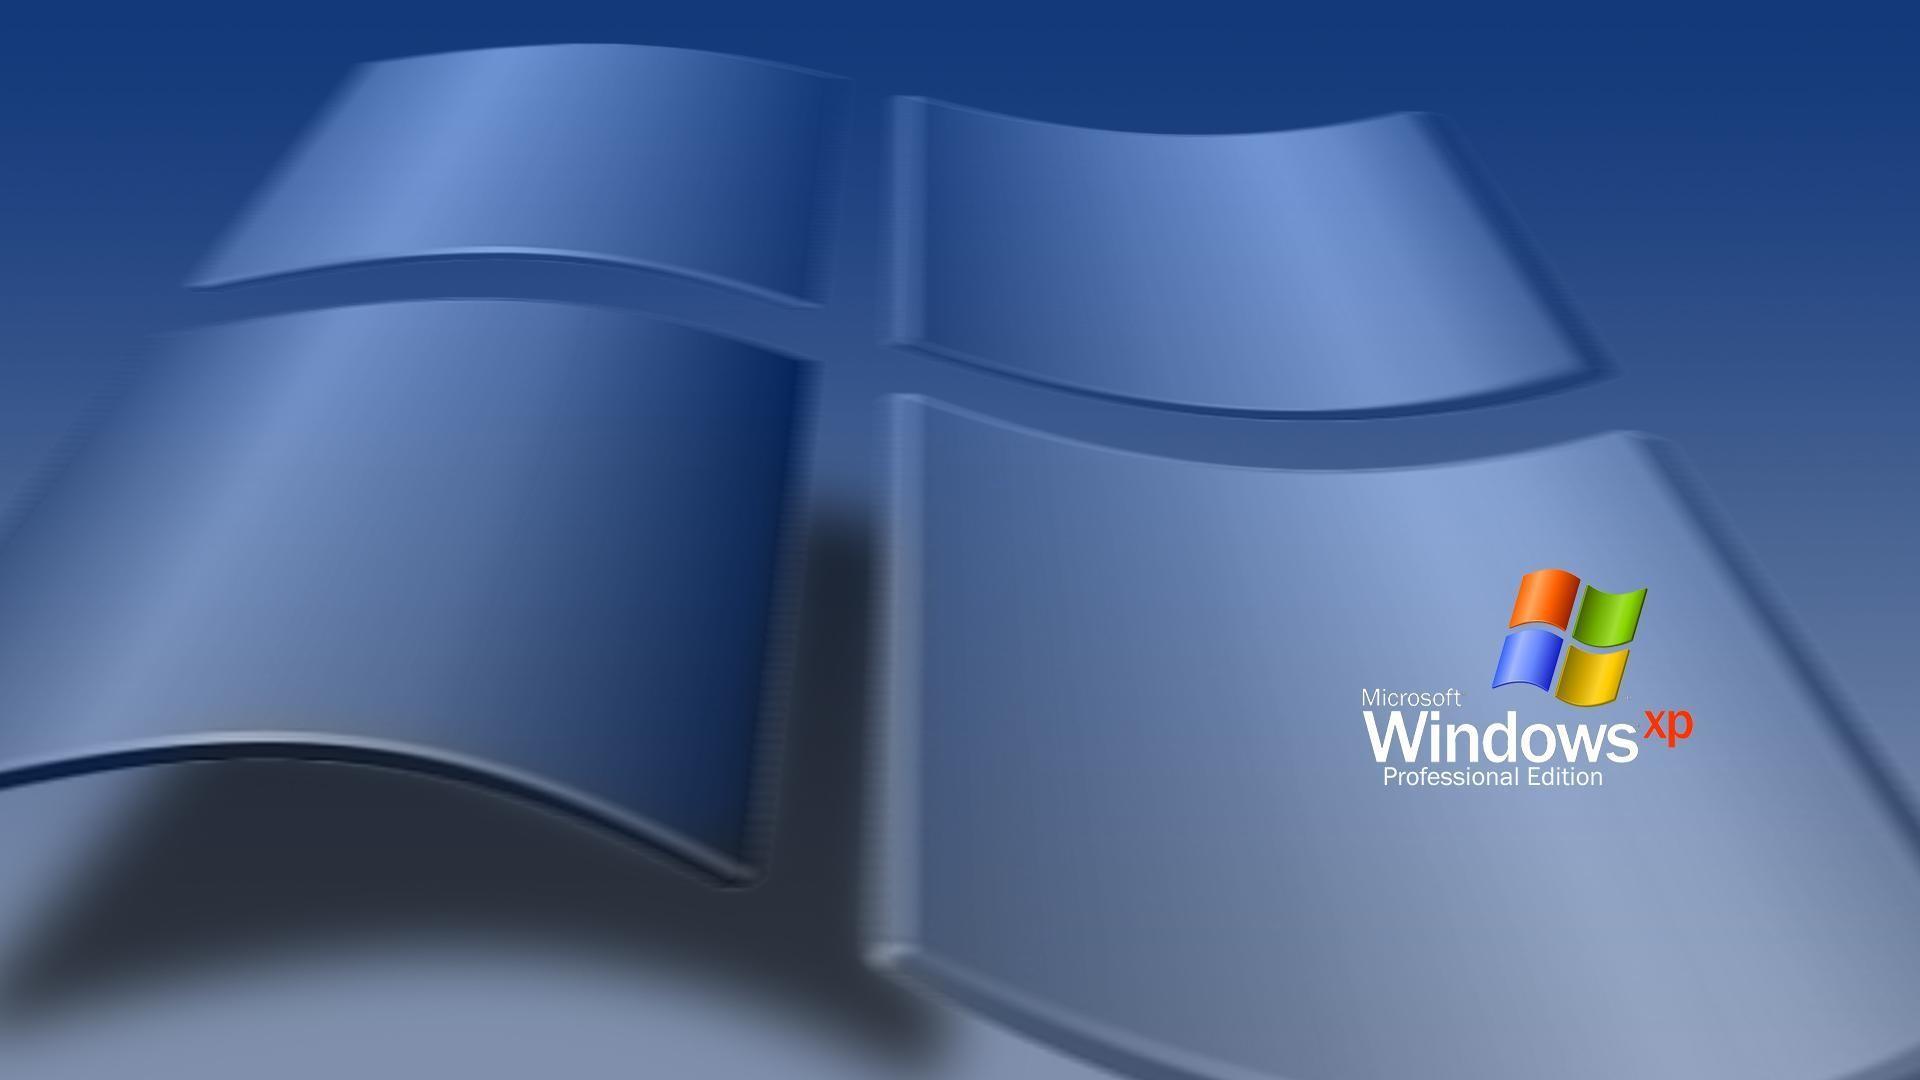 Learn windows xp professional